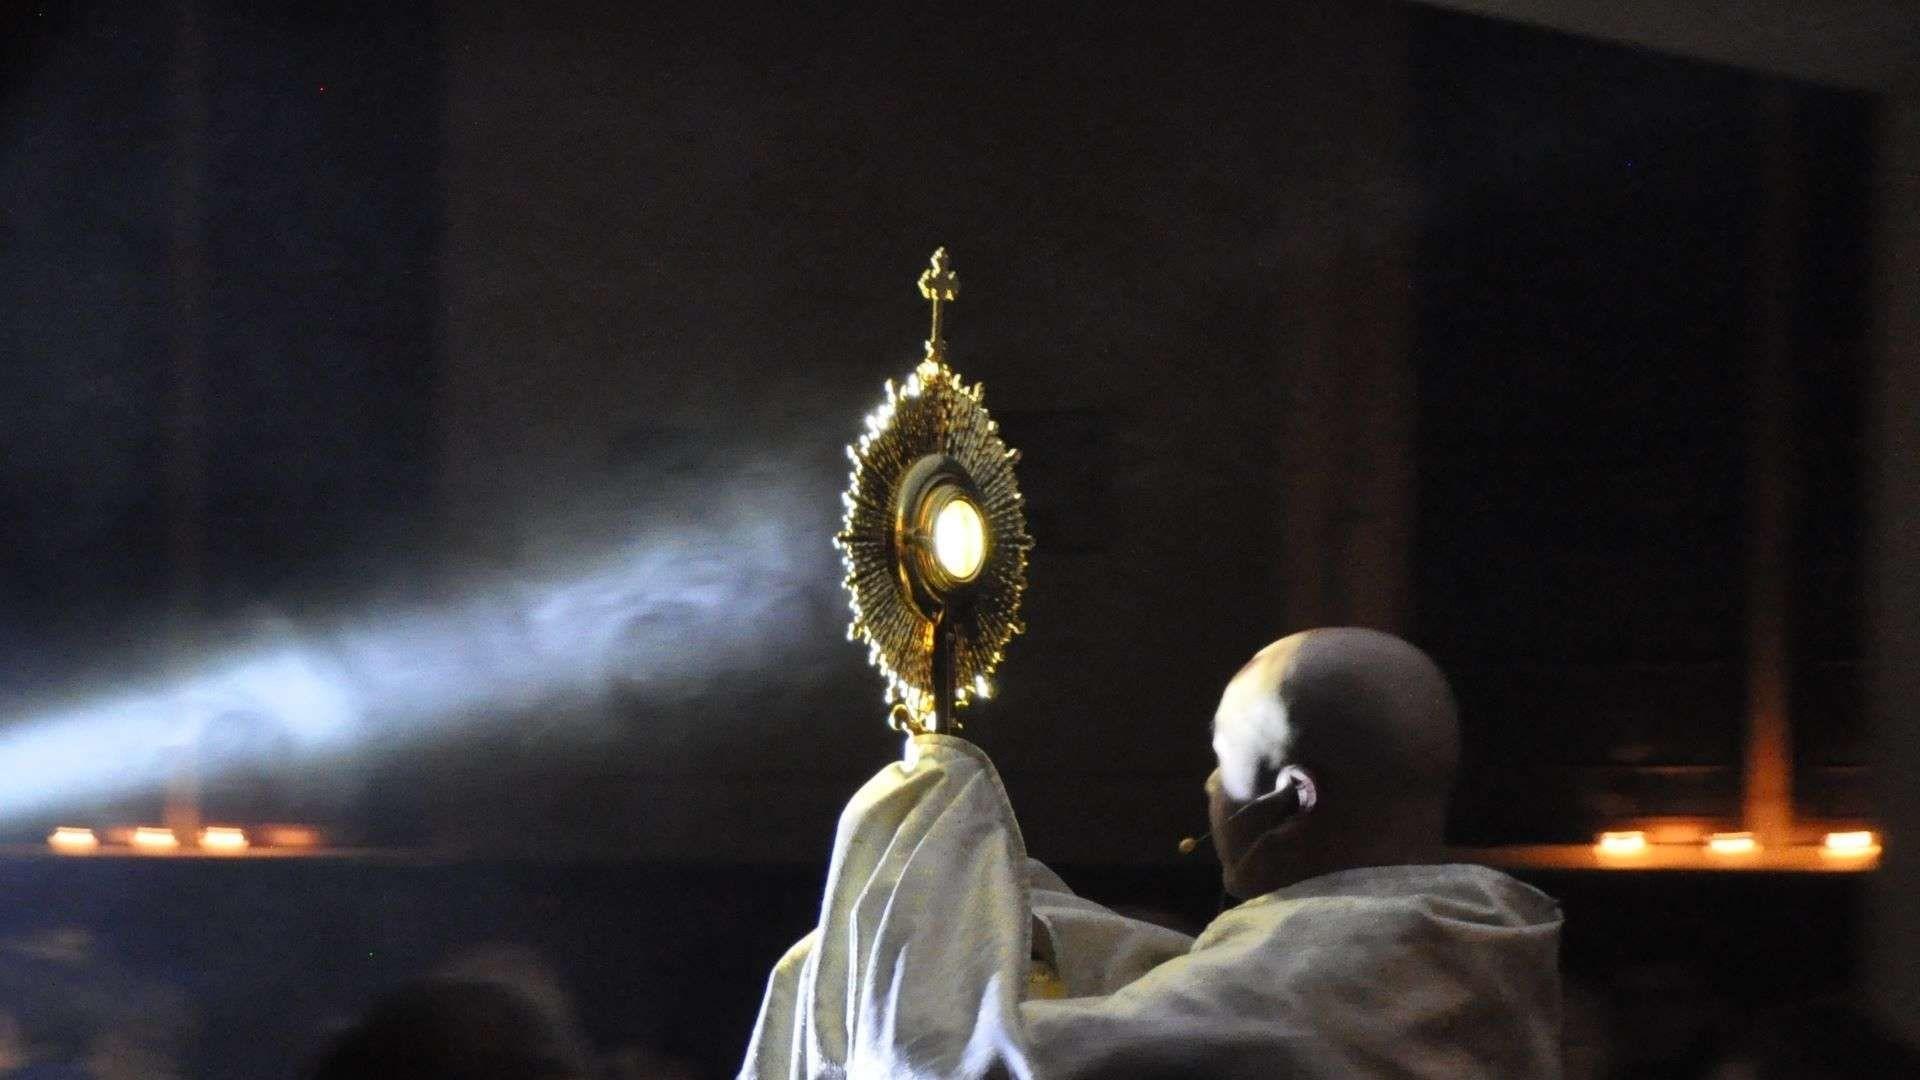 Res: 1920x1080, Pin by Joe Aboumoussa on Eucharist / Holy Mass | Pinterest | Eucharist